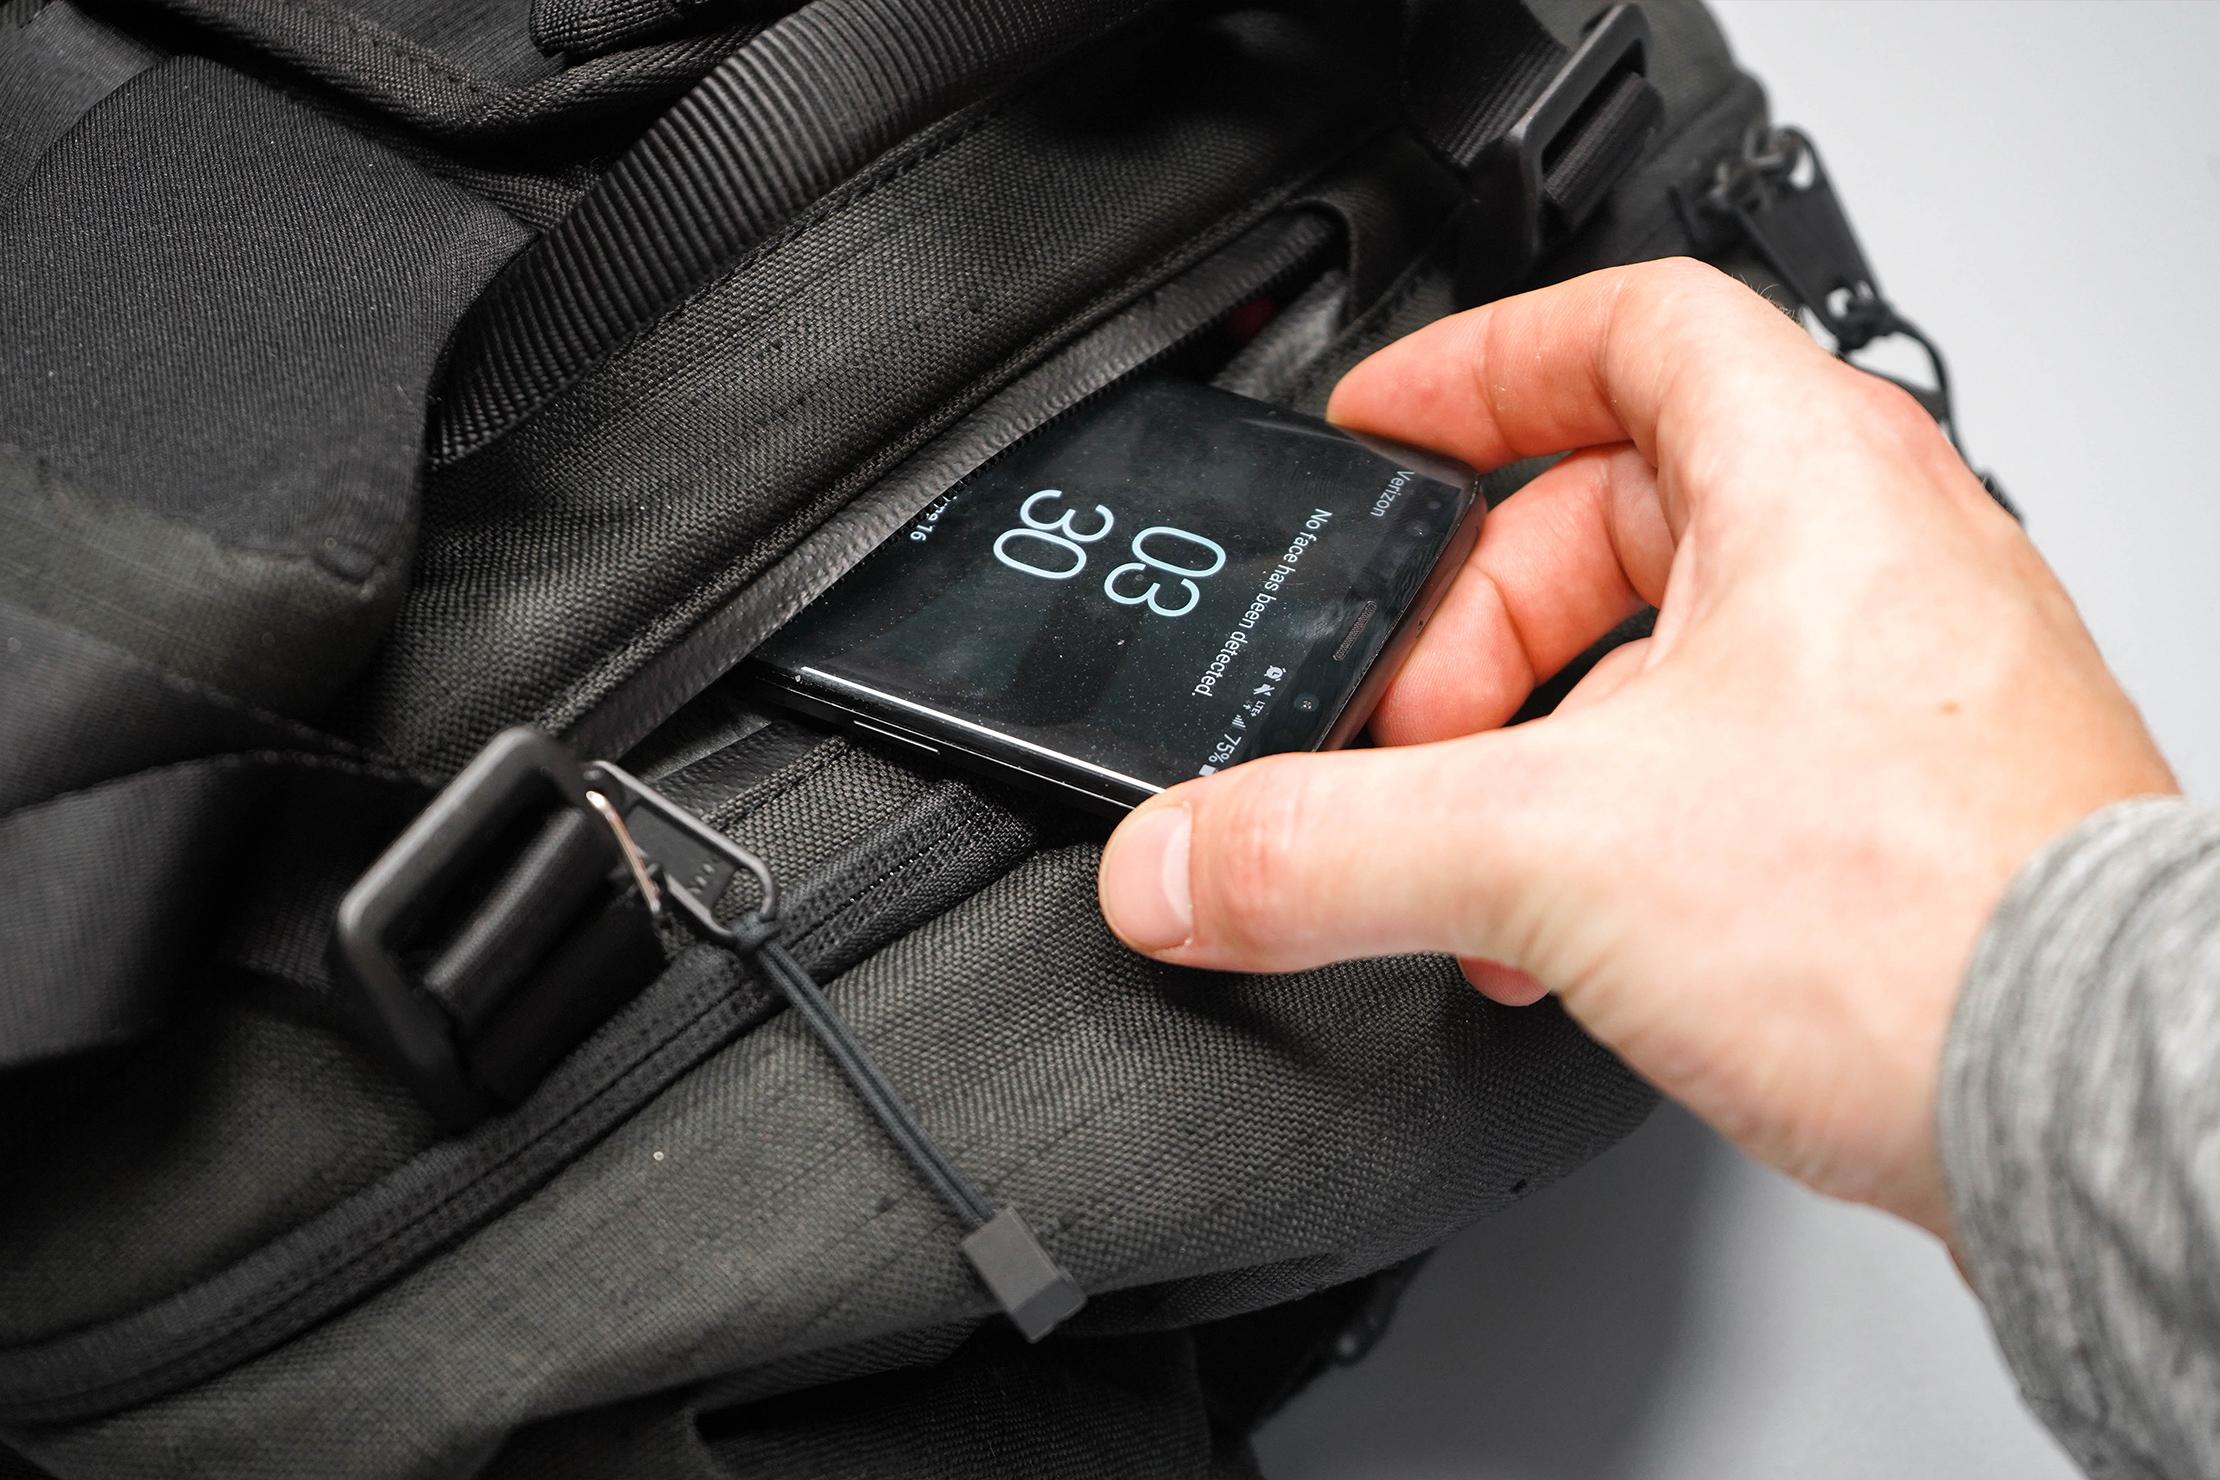 WAYKS ONE Cube Top Quick-Grab Pocket